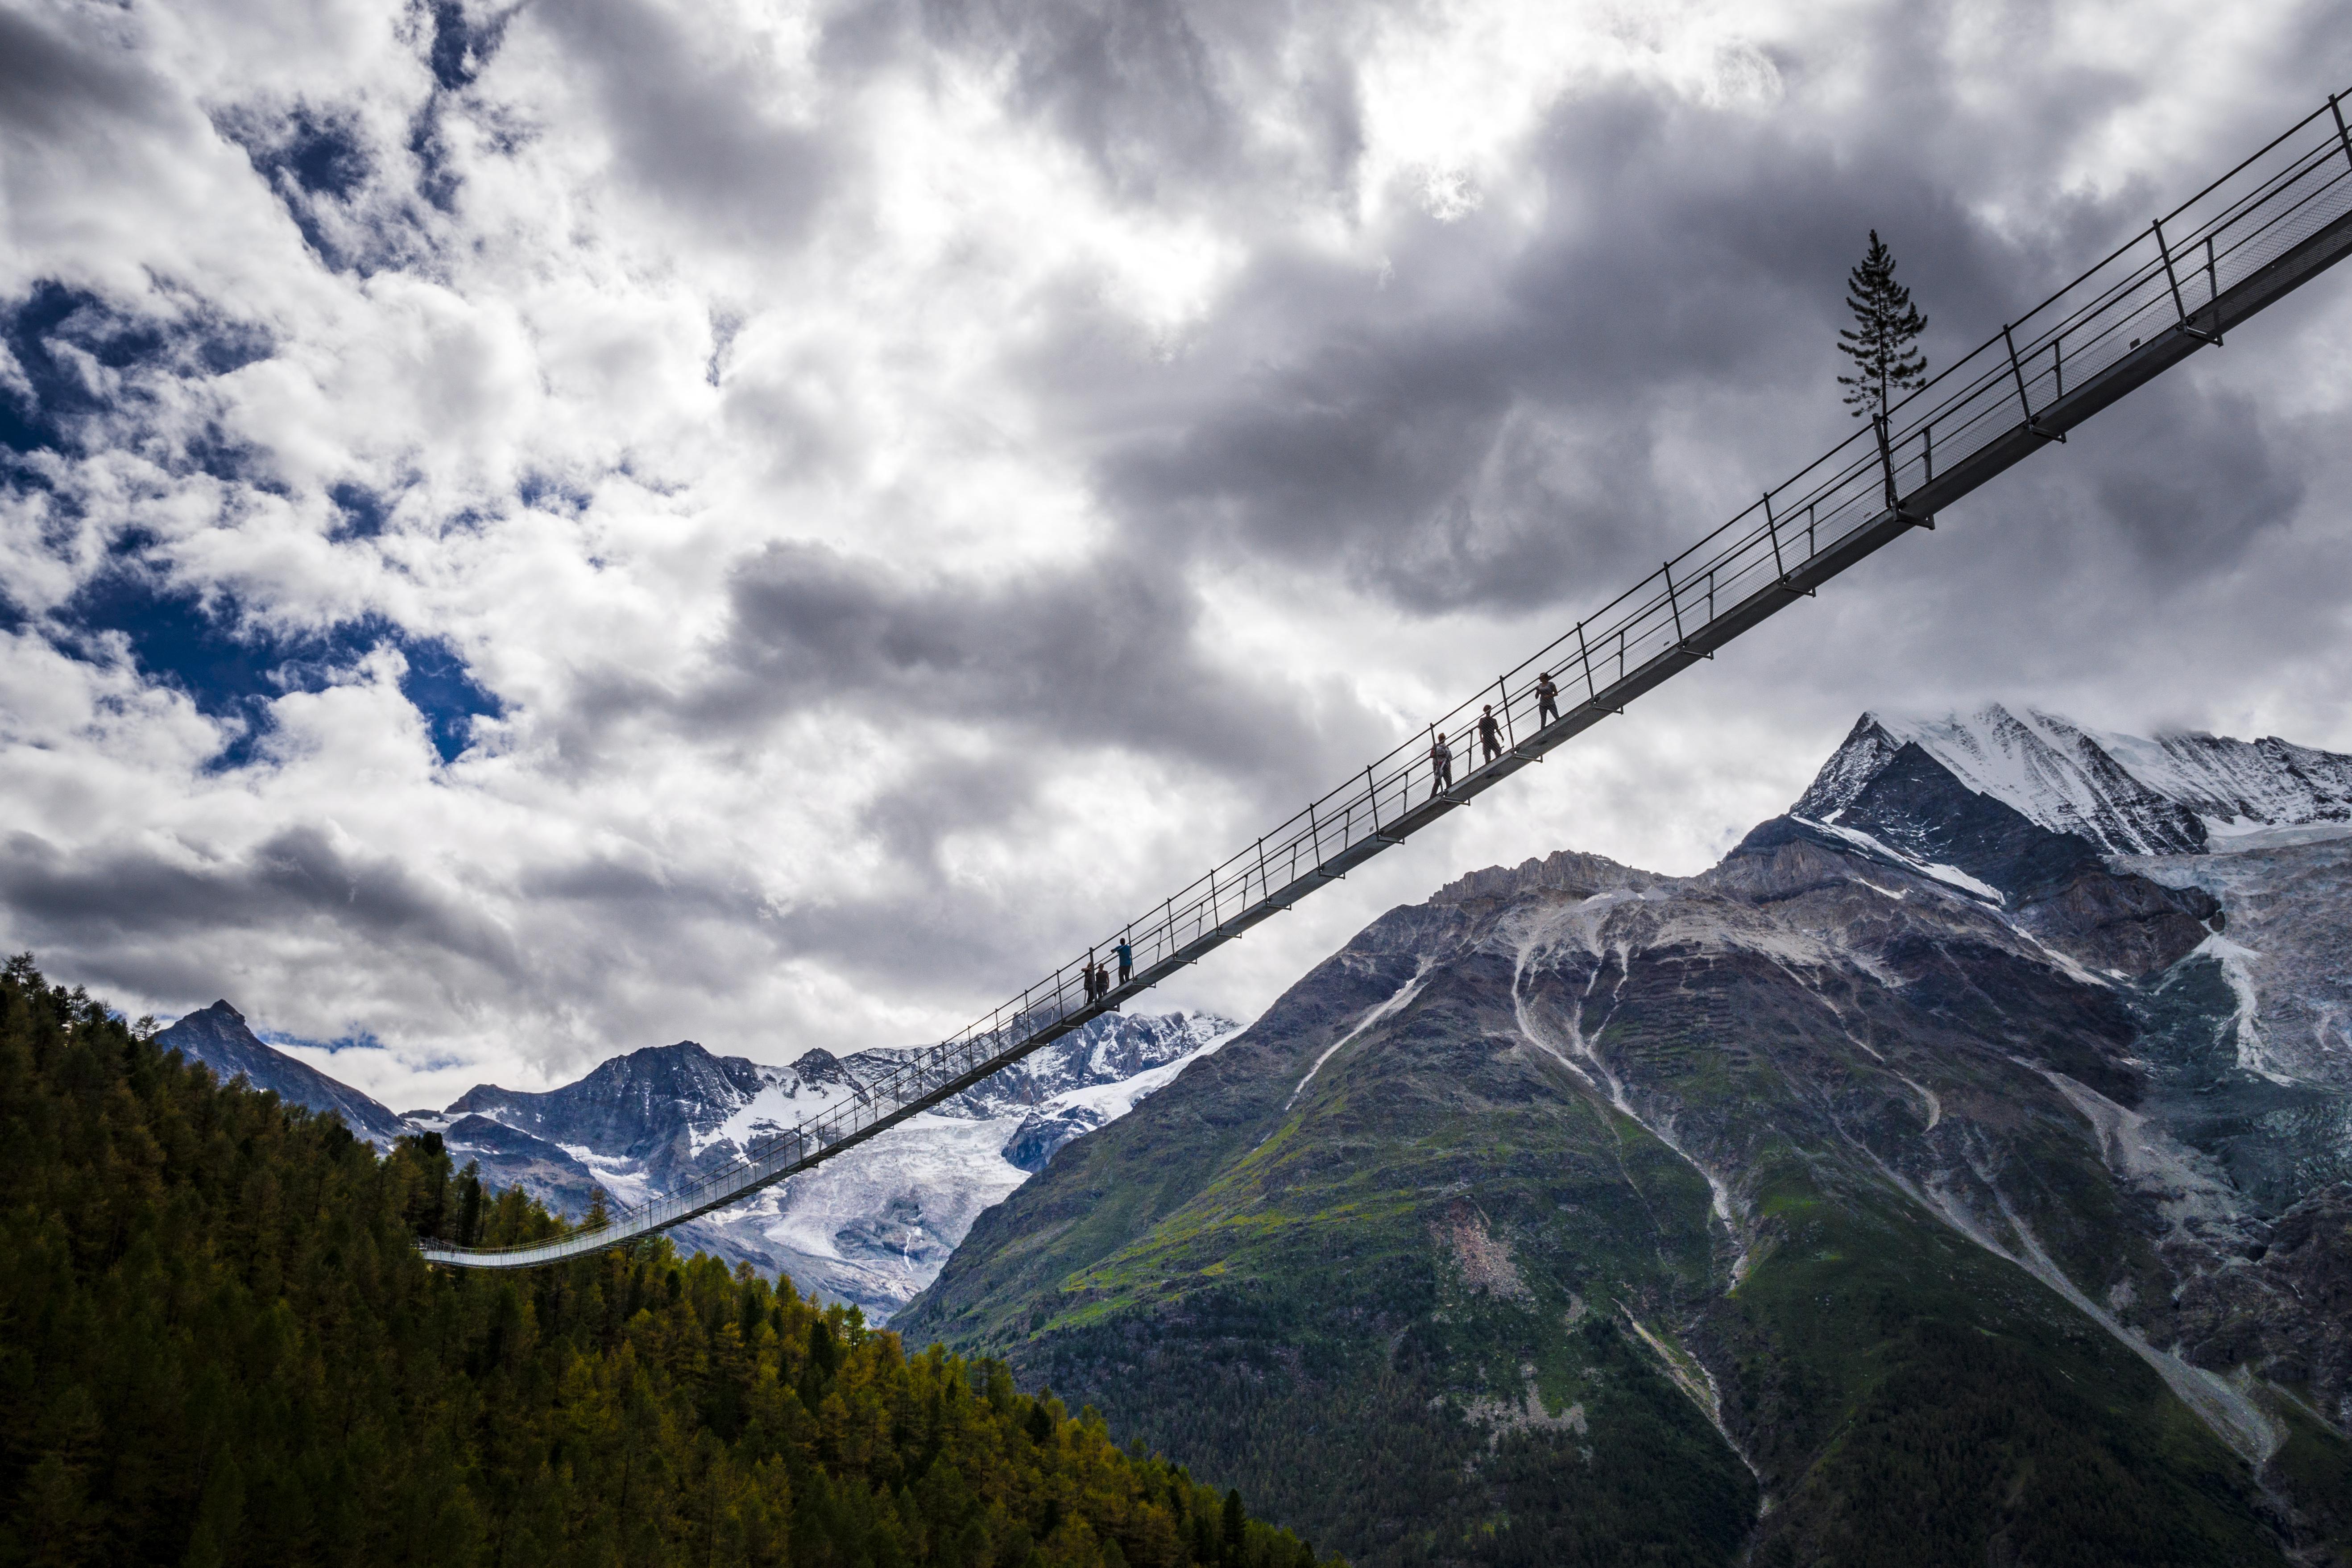 Charles Kuonen-Hängebrücke bei Randa